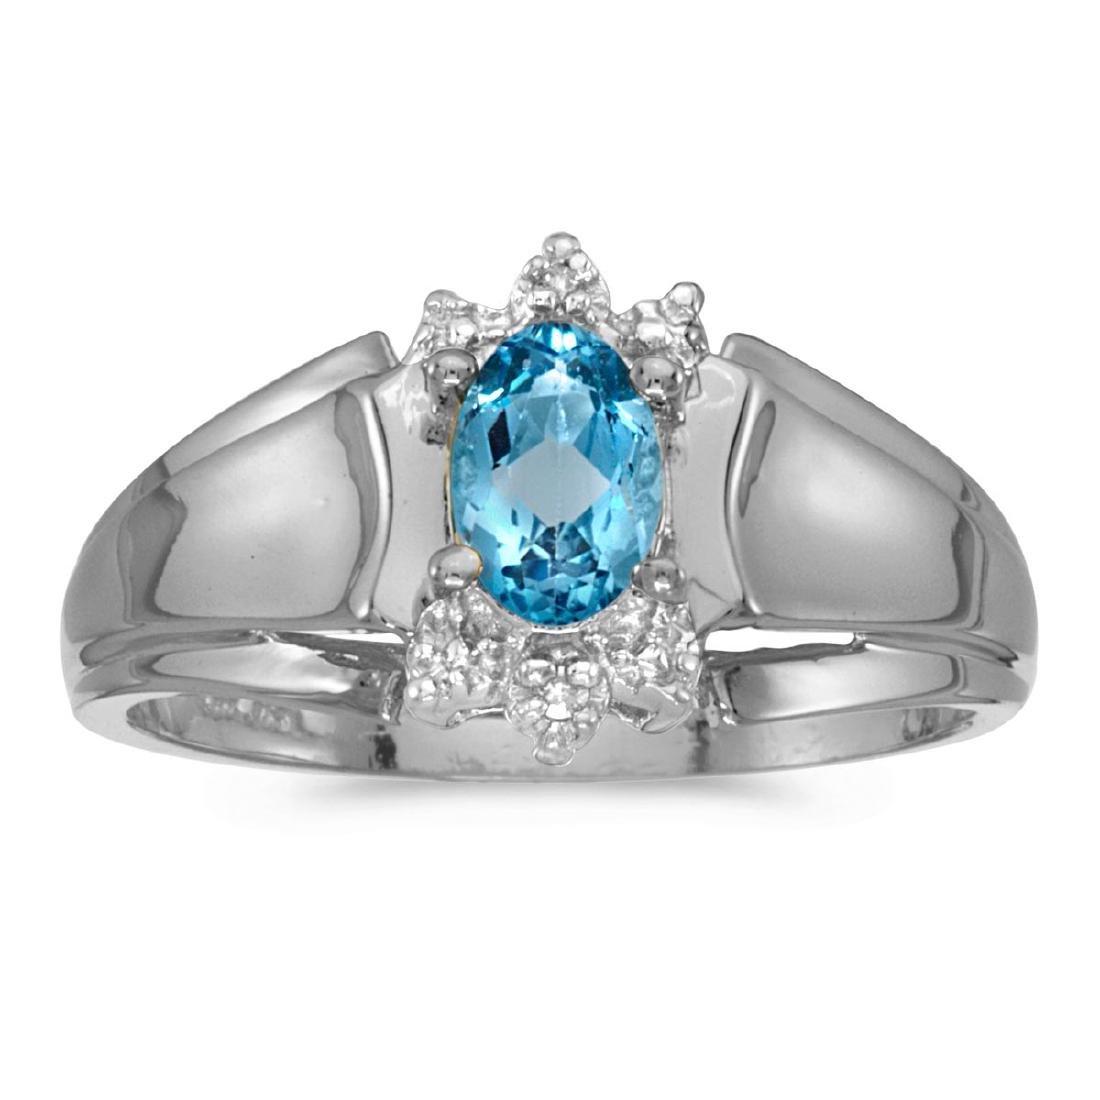 Certified 14k White Gold Oval Blue Topaz And Diamond Ri